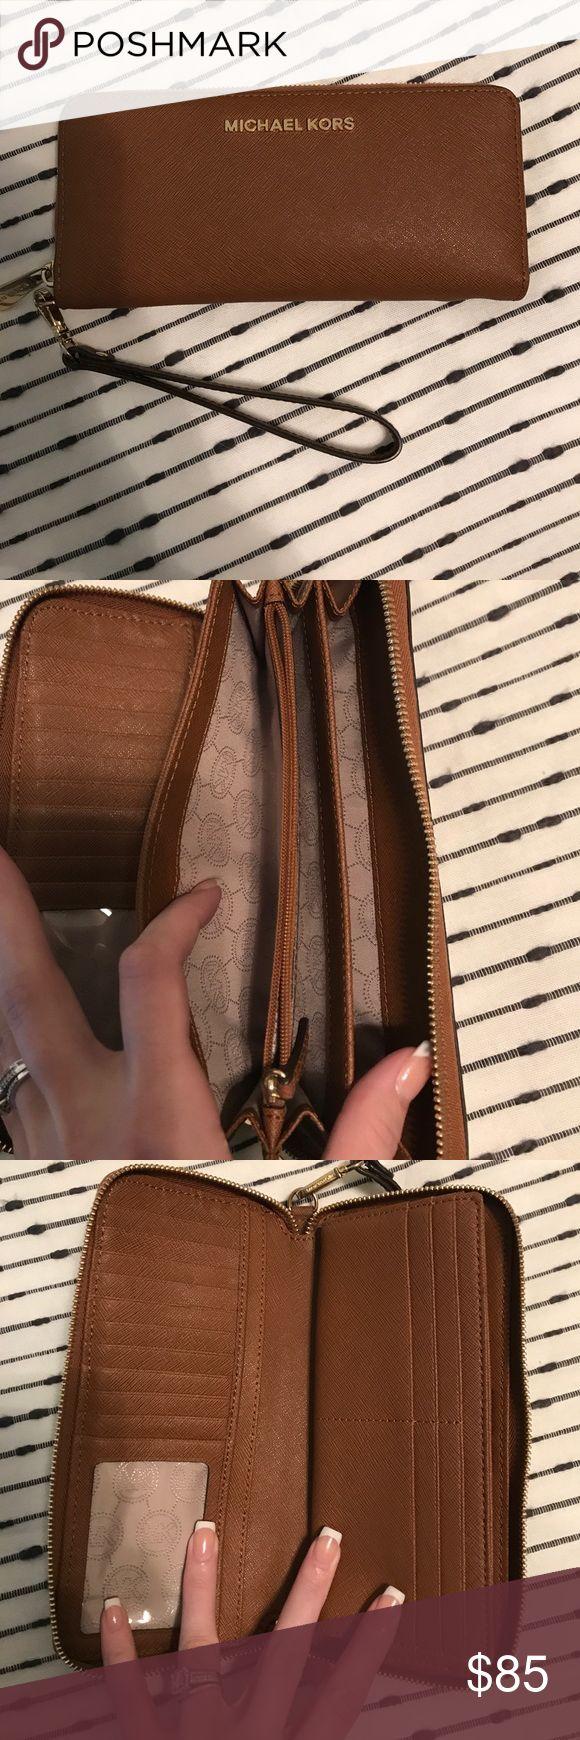 Authentic Michael Kors jet set wallet Like new brown jet set Michael Kors wallet. 100% authentic Michael Kors Bags Wallets